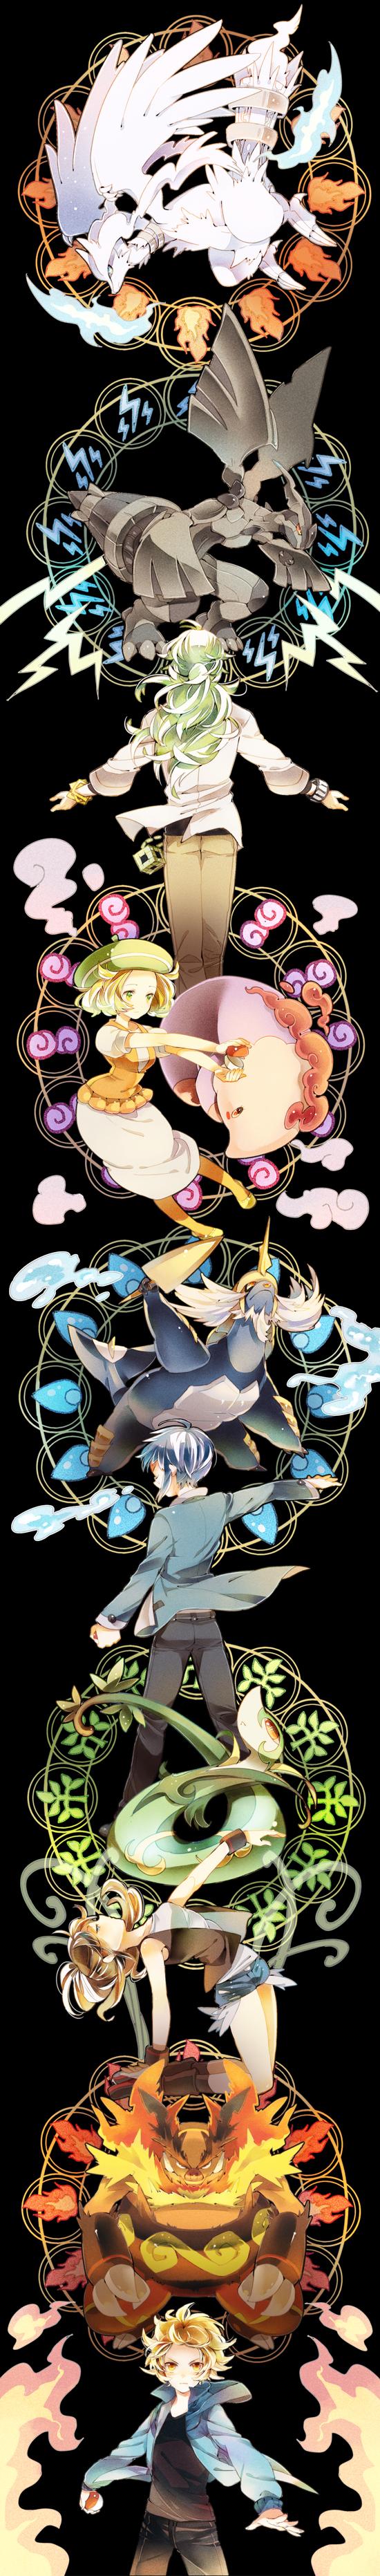 Tags: Anime, Yuuichi-87, Pokémon, Touko (Pokémon), Samurott, N (Pokémon), Musharna, Serperior, Zekrom, Touya (Pokémon), Bel (Pokémon), Reshiram, Emboar